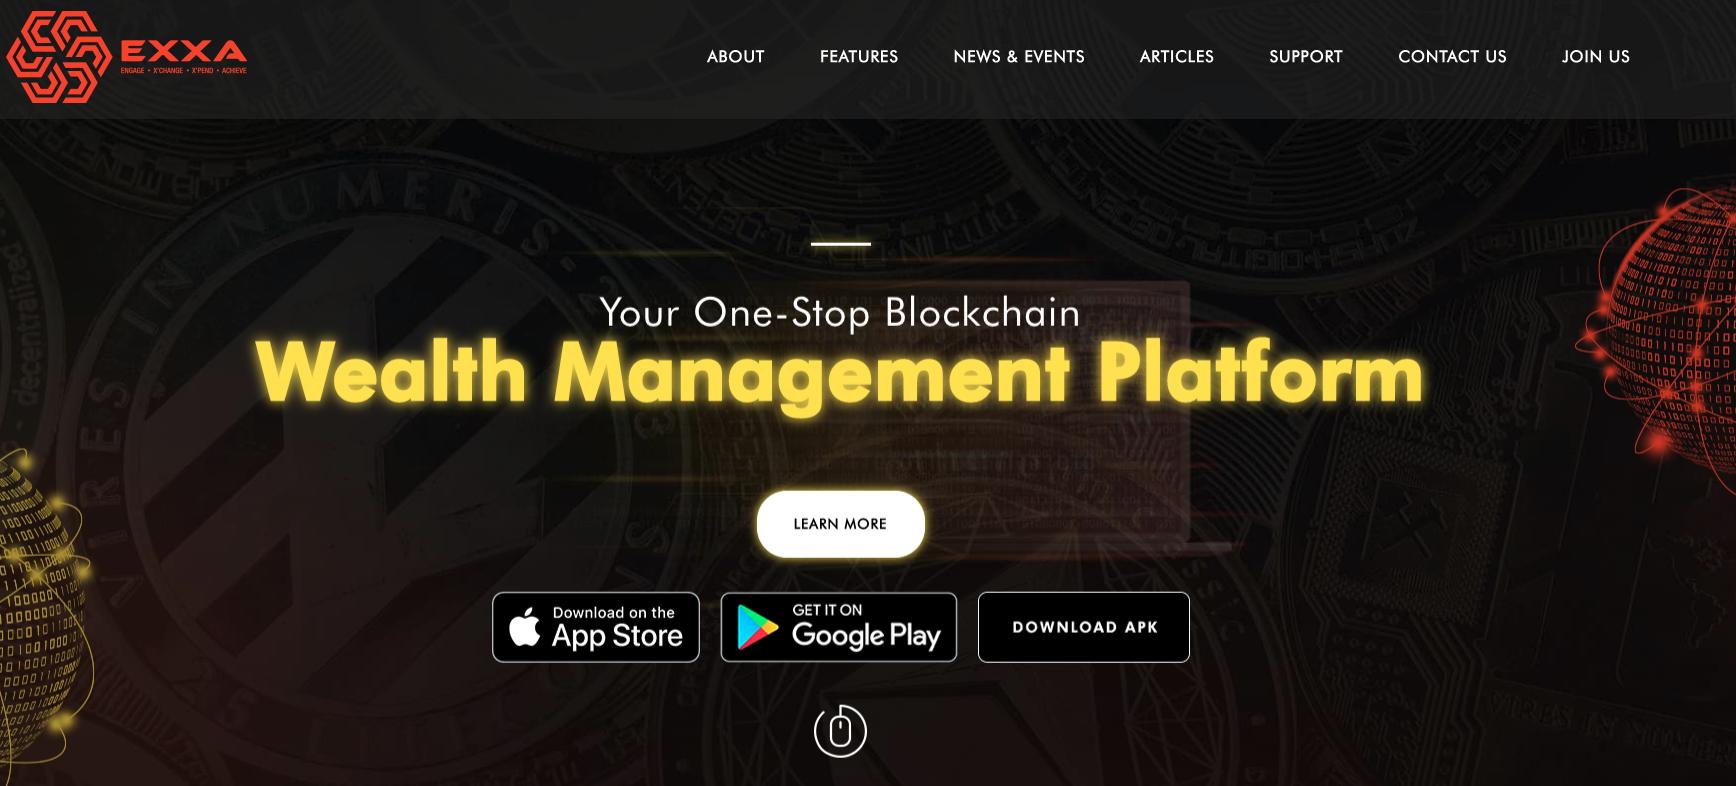 Exxa Wallet Review – Is Exxa.net Scam or Legit Crypto MLM?